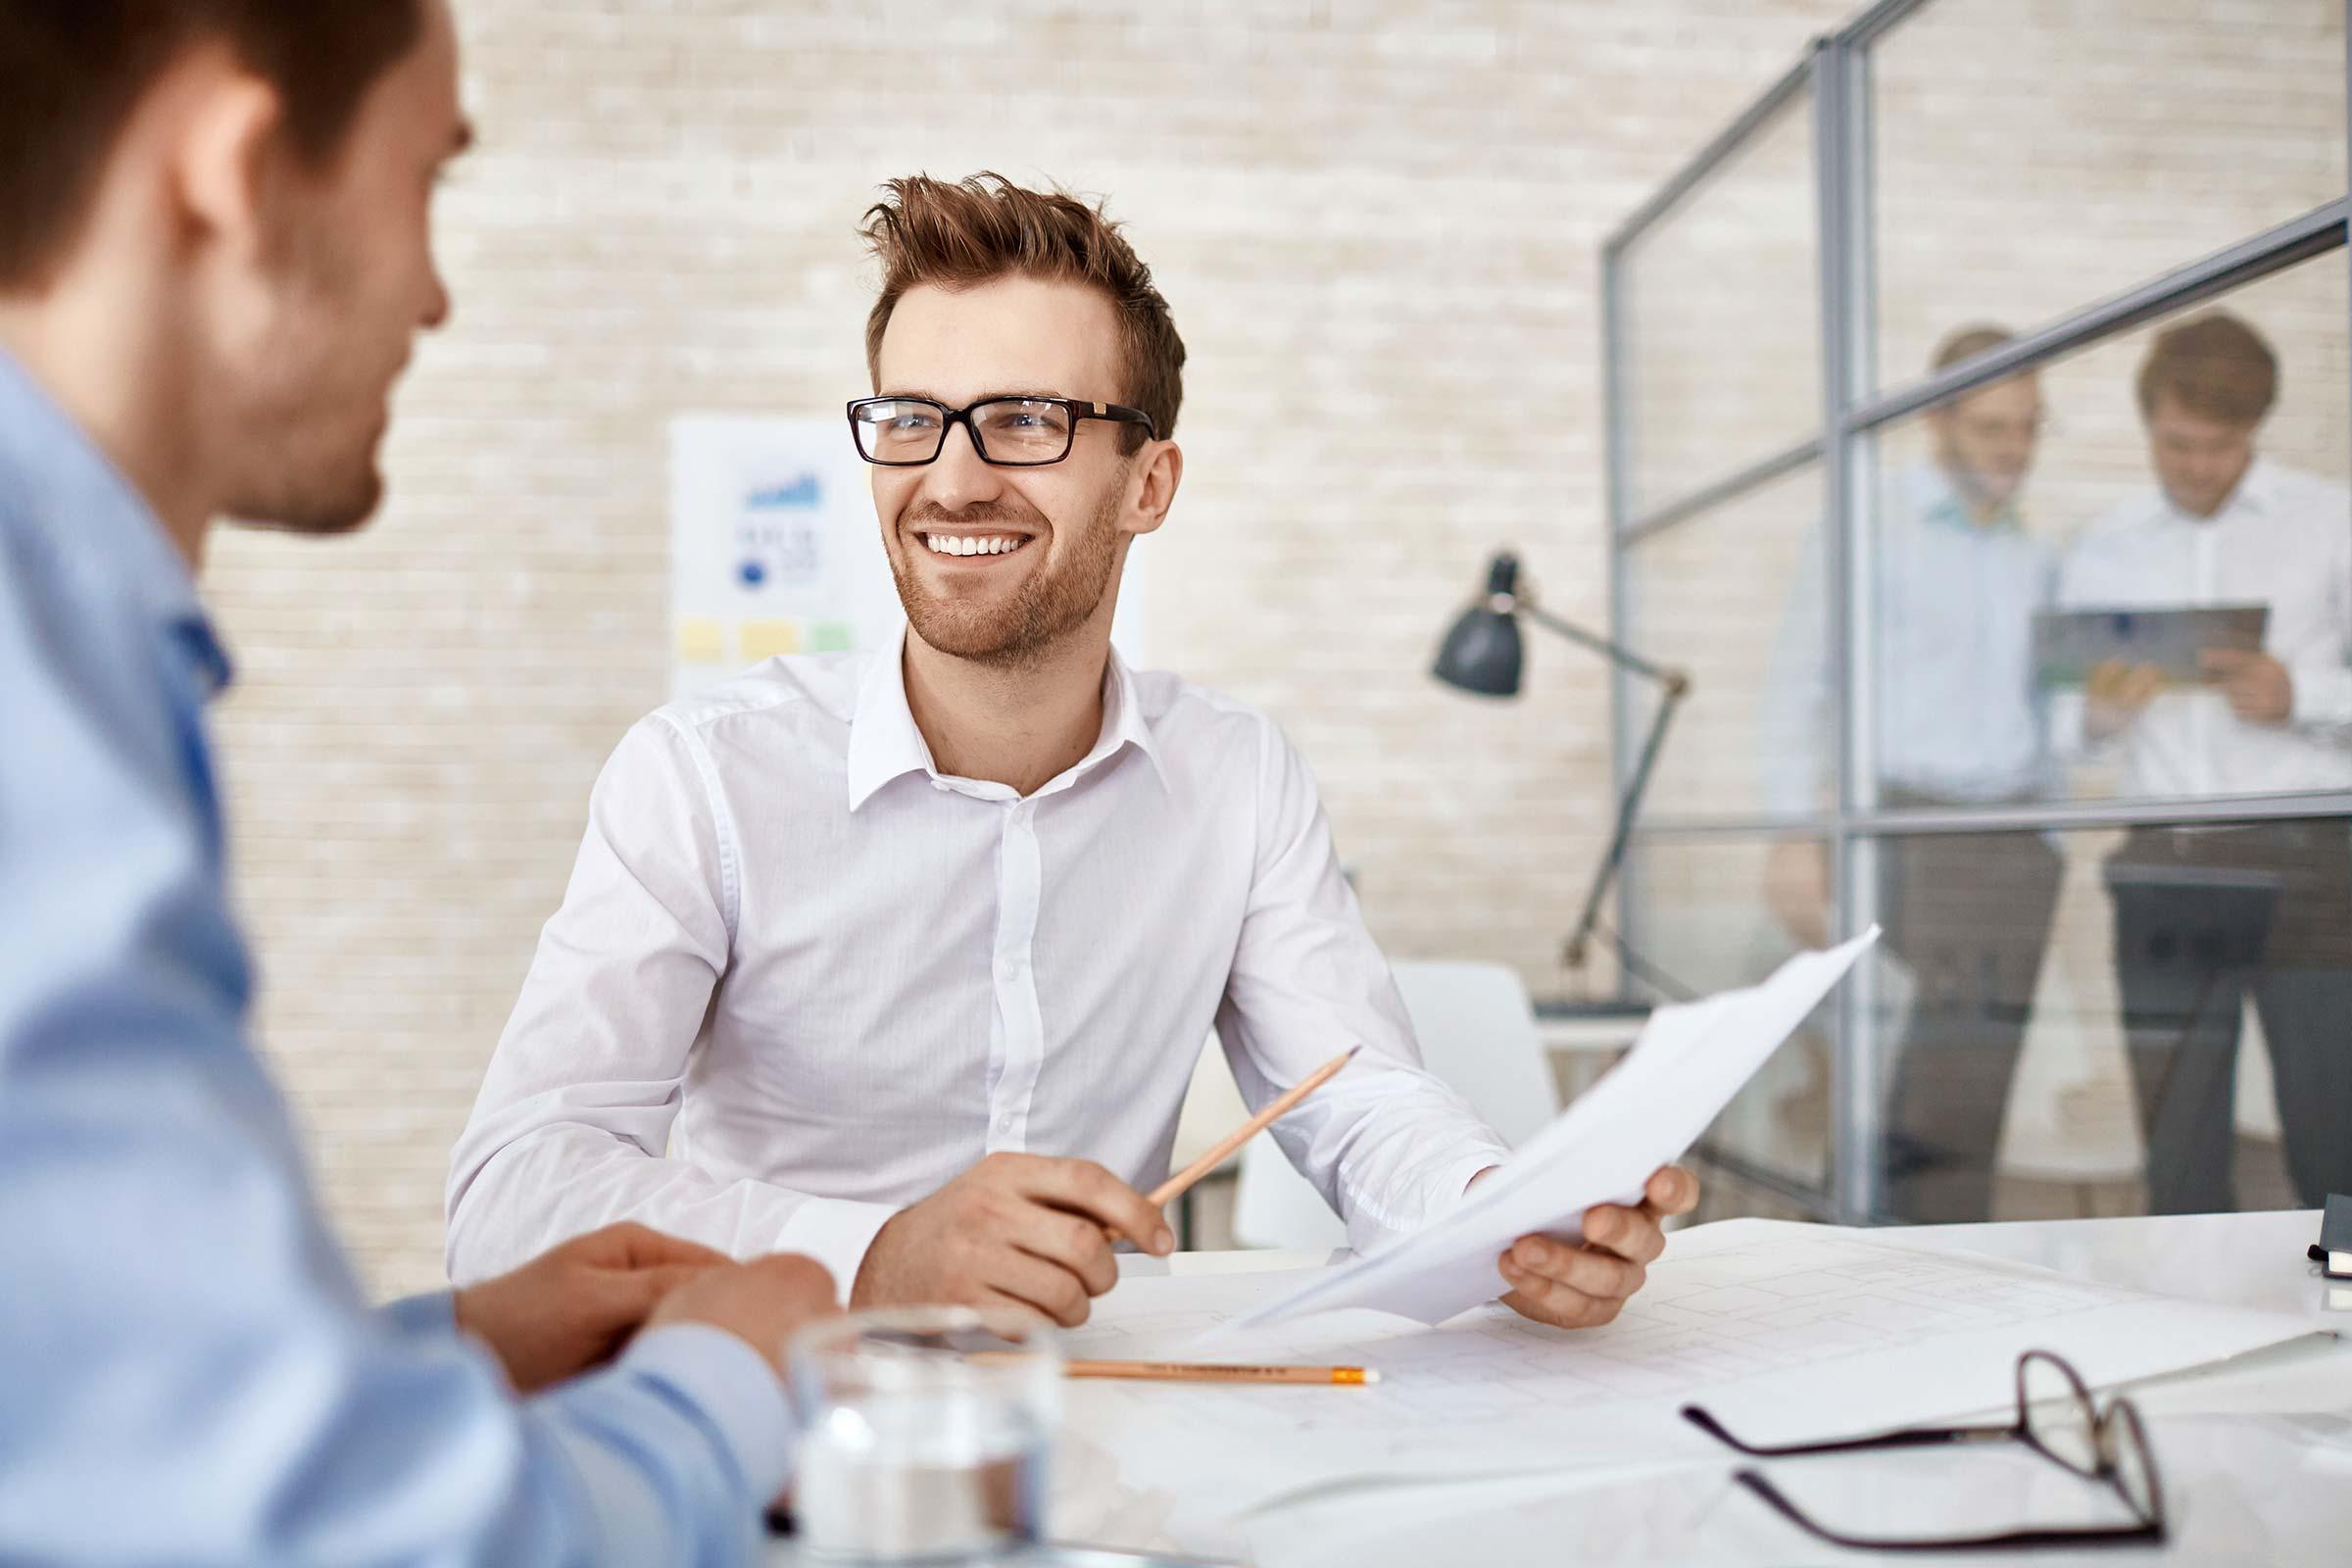 Questions You Should Ask at a Job Interview | Reader's Digest